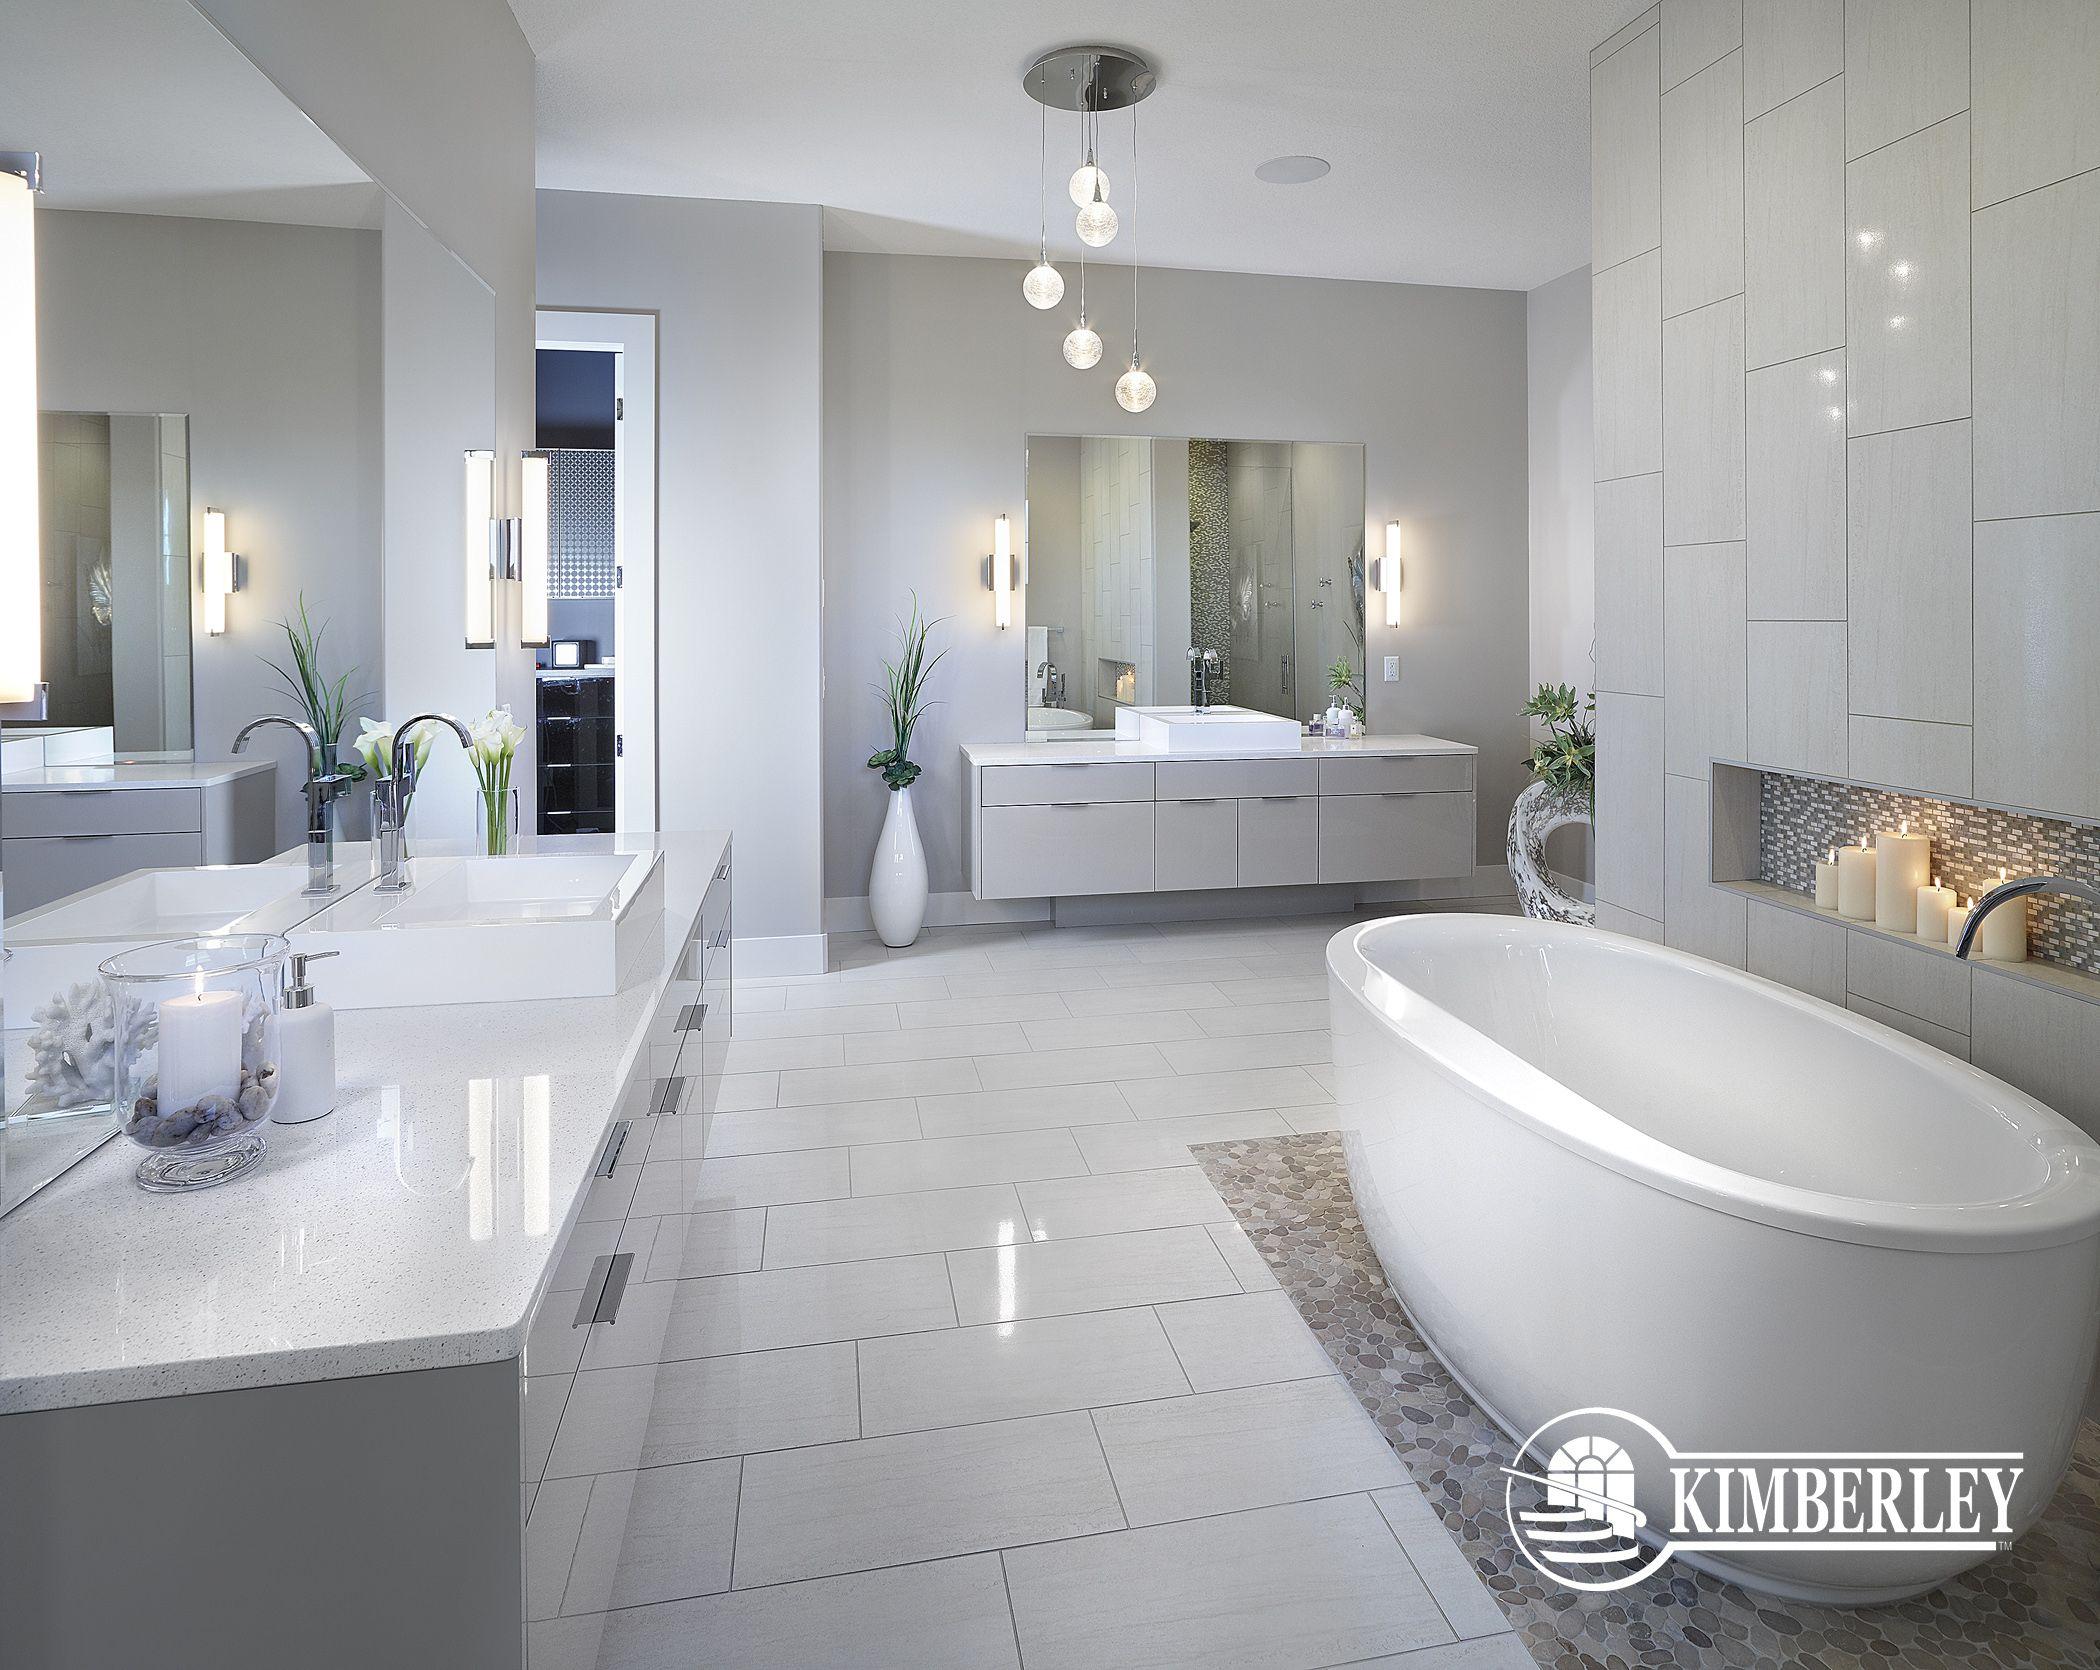 Master Ensuite In A Custom Infill Double Vanities Freestanding Tub Modern Details Kimberley Hom Bathroom Inspiration Decor Dream Bathrooms Bathroom Design